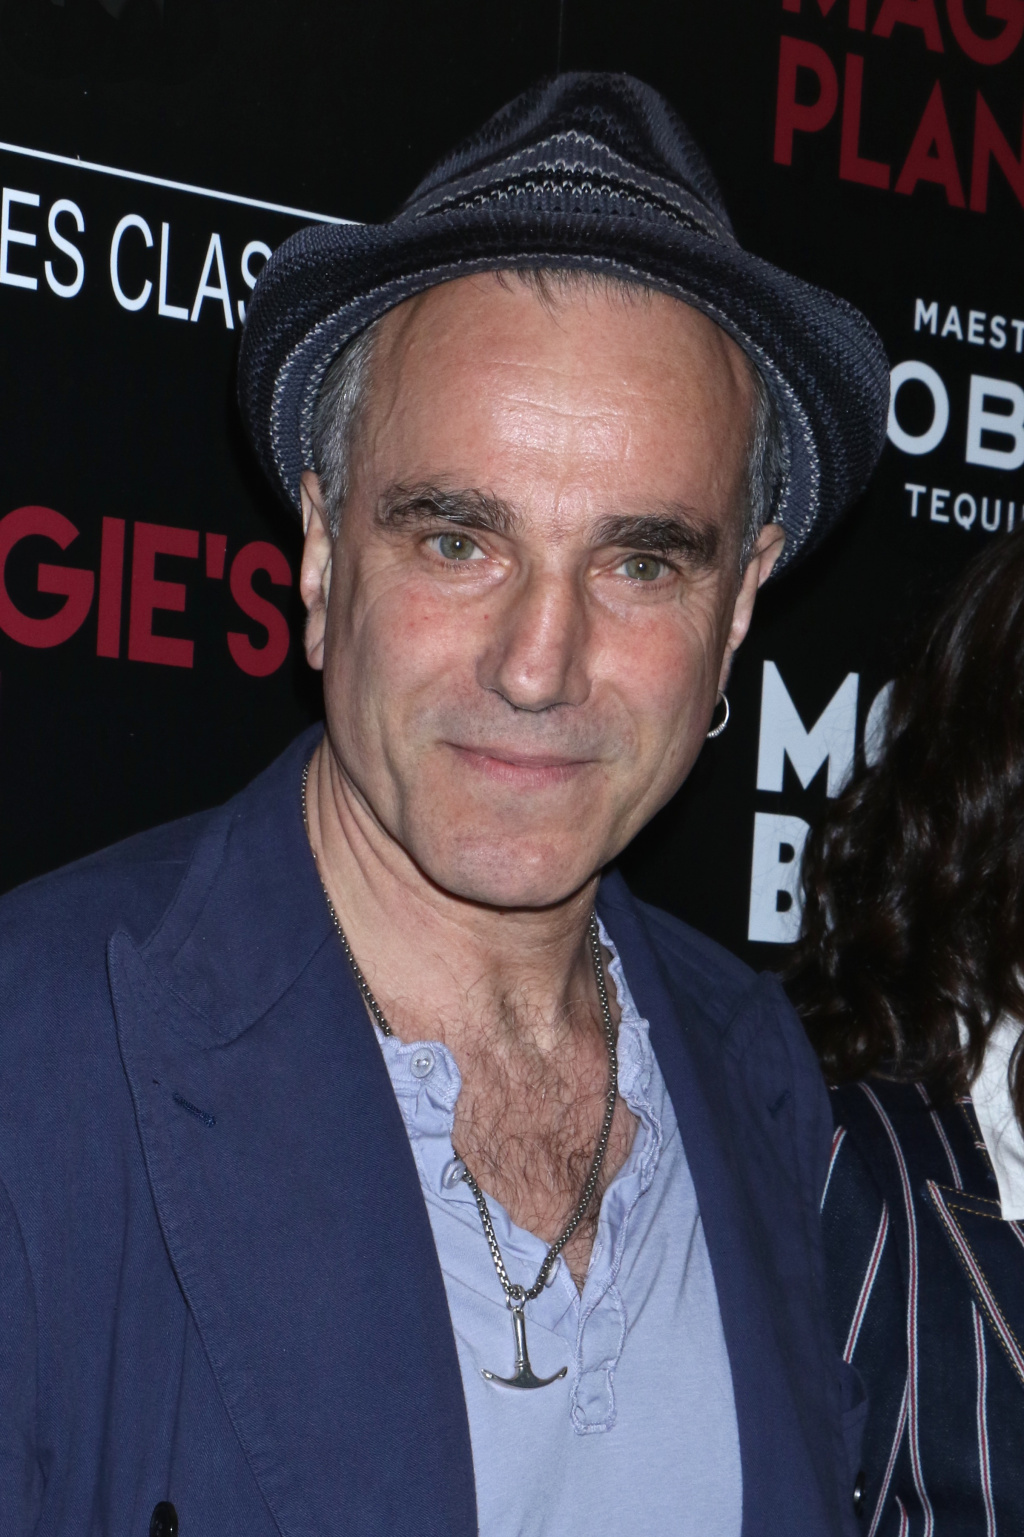 'Maggie's Plan' film premiere, New York, America - 05 May 2016